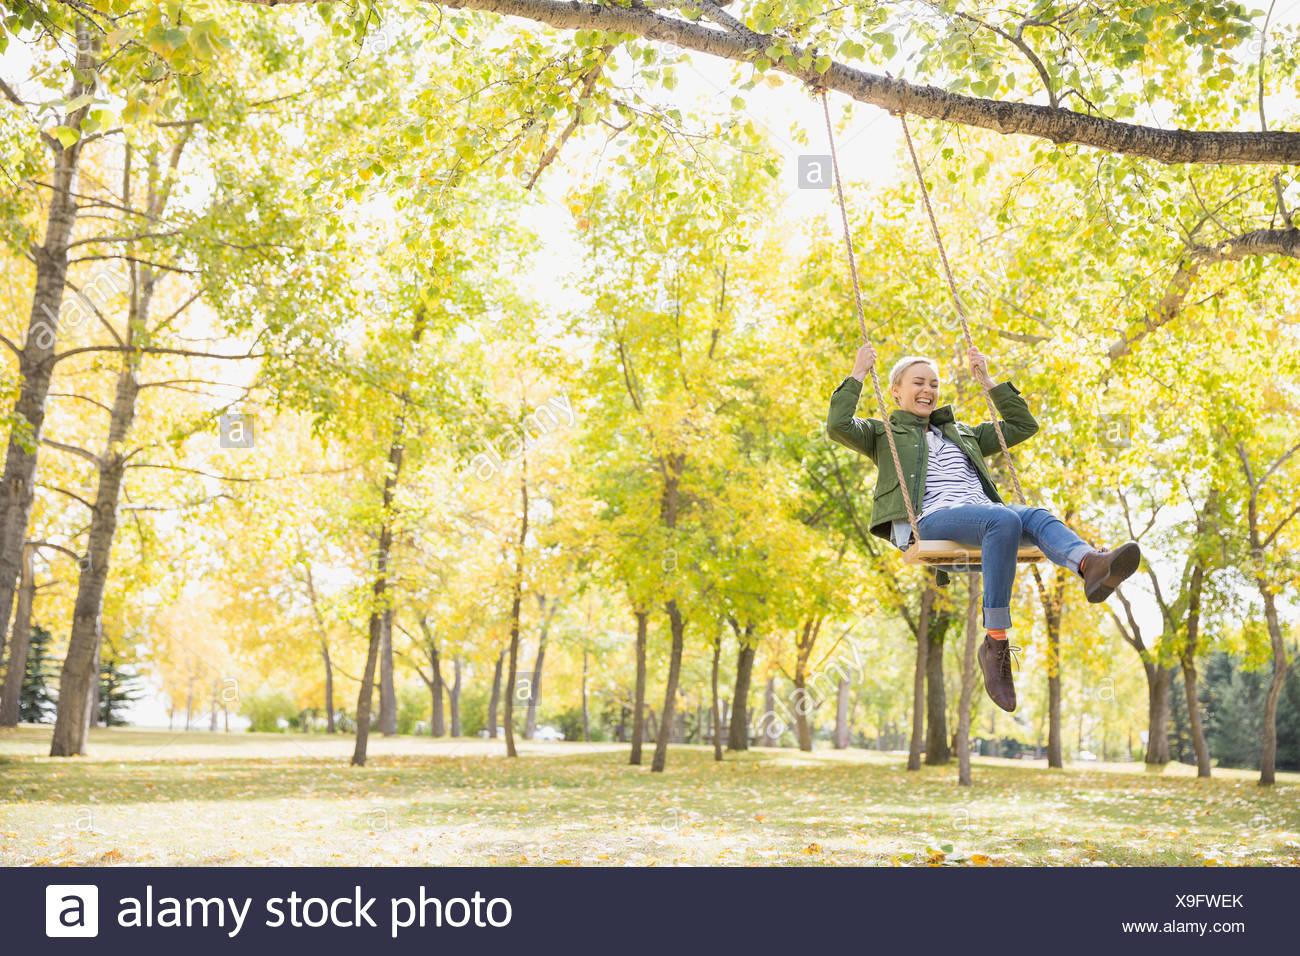 Playful woman swinging - Stock Image